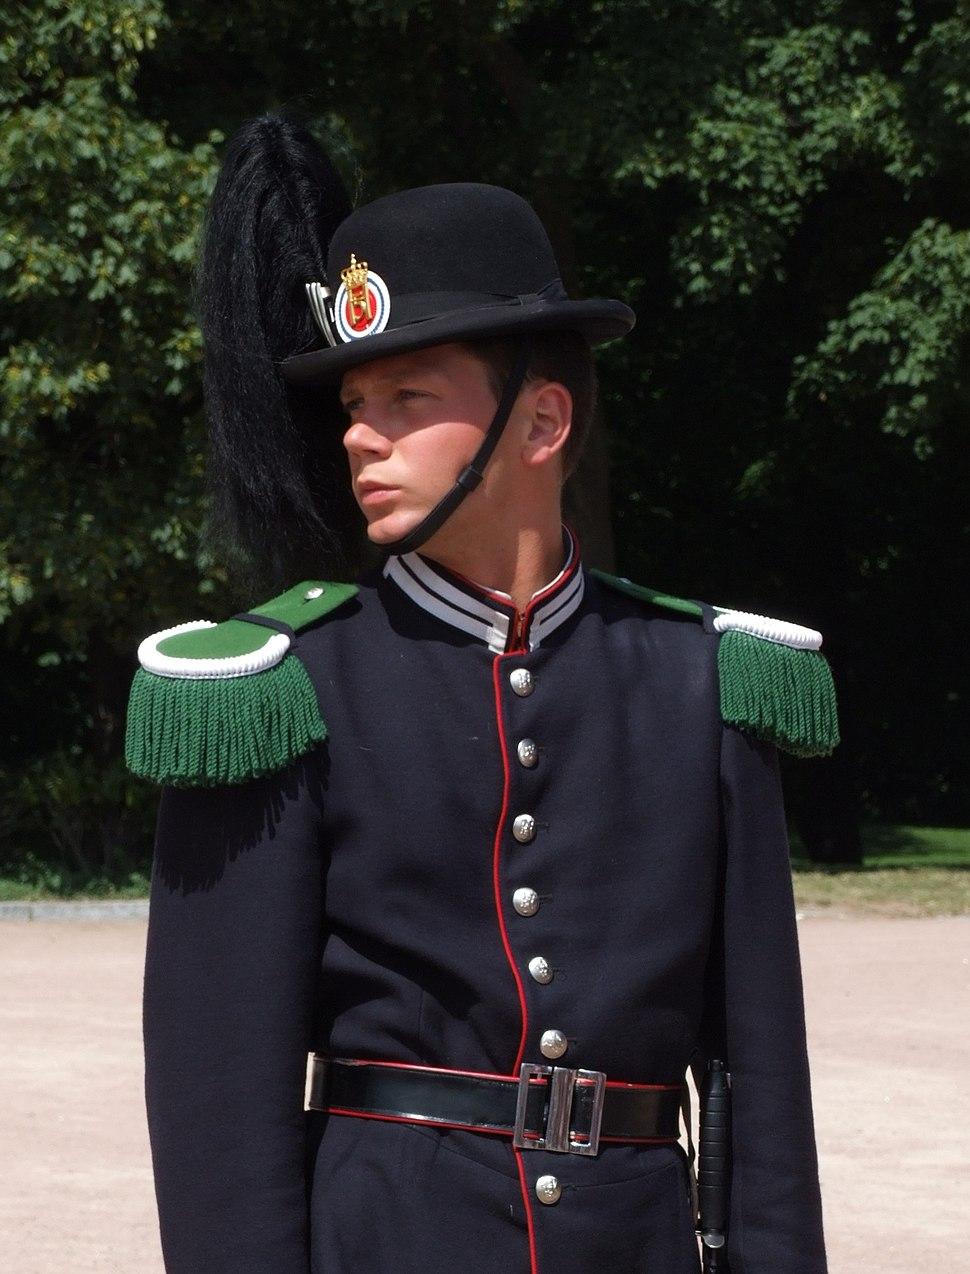 Hans Majestet Kongens Garde - soldier-edited